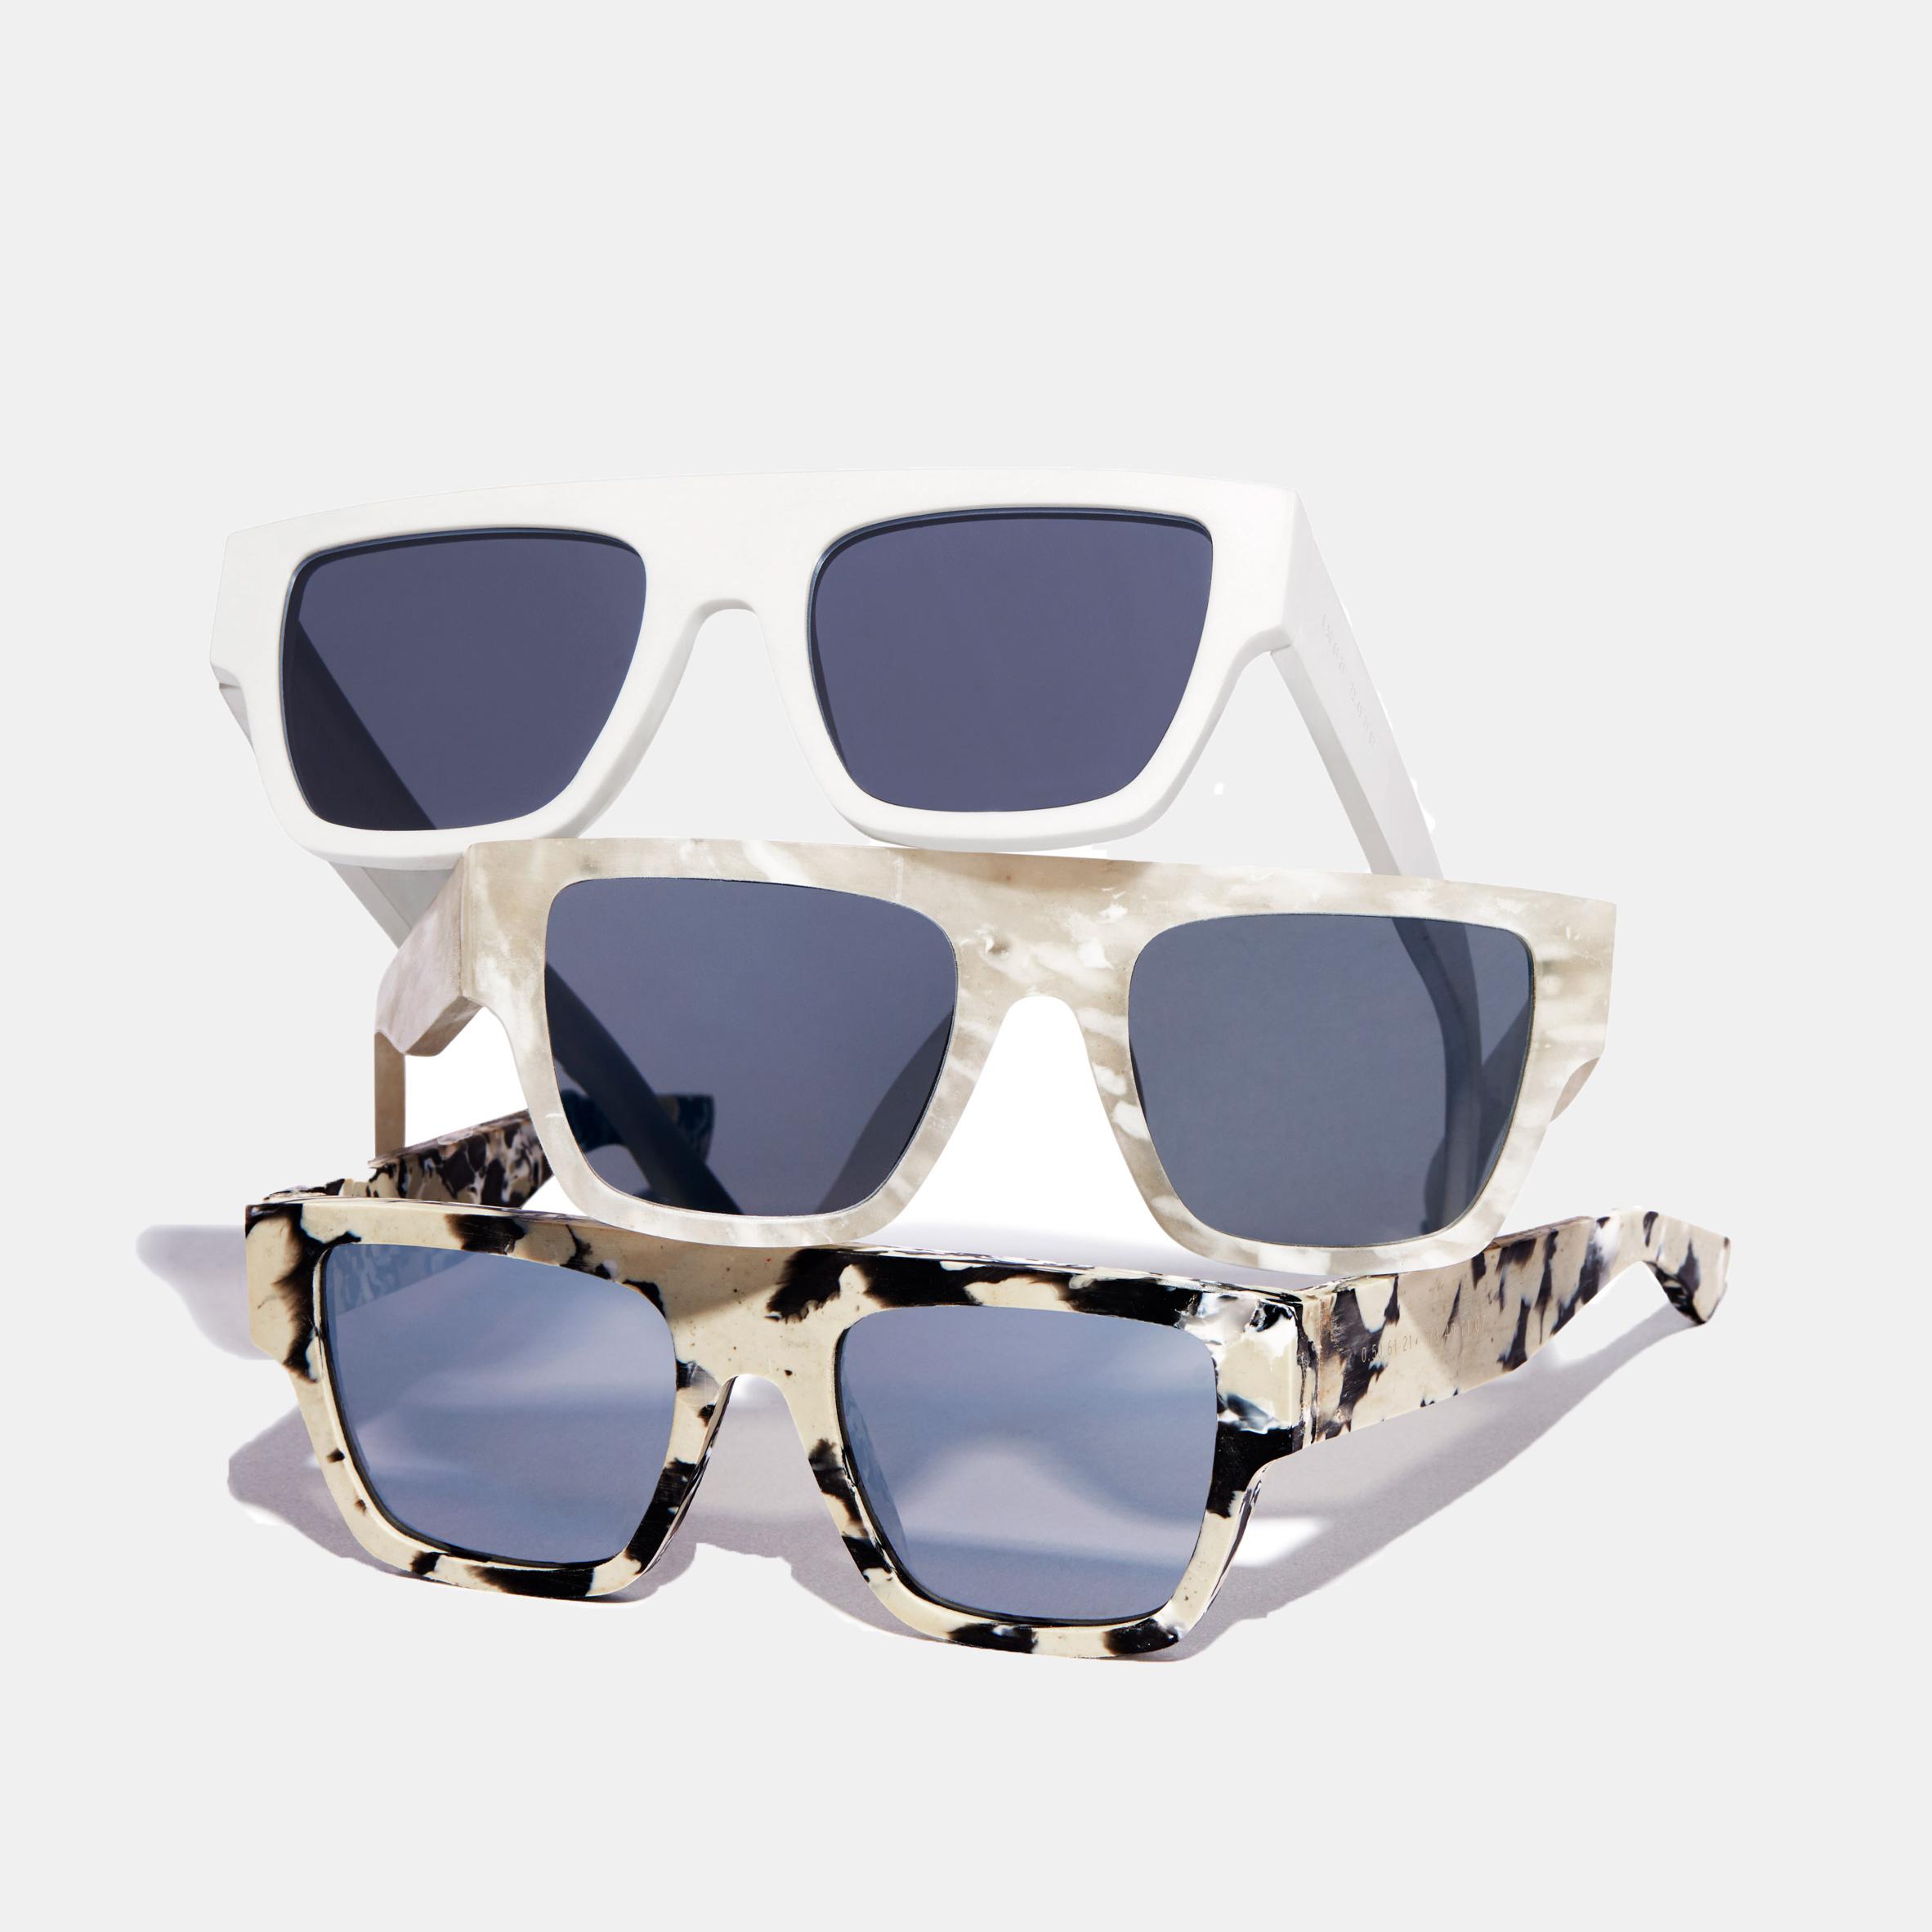 Parley and Corona sunglasses